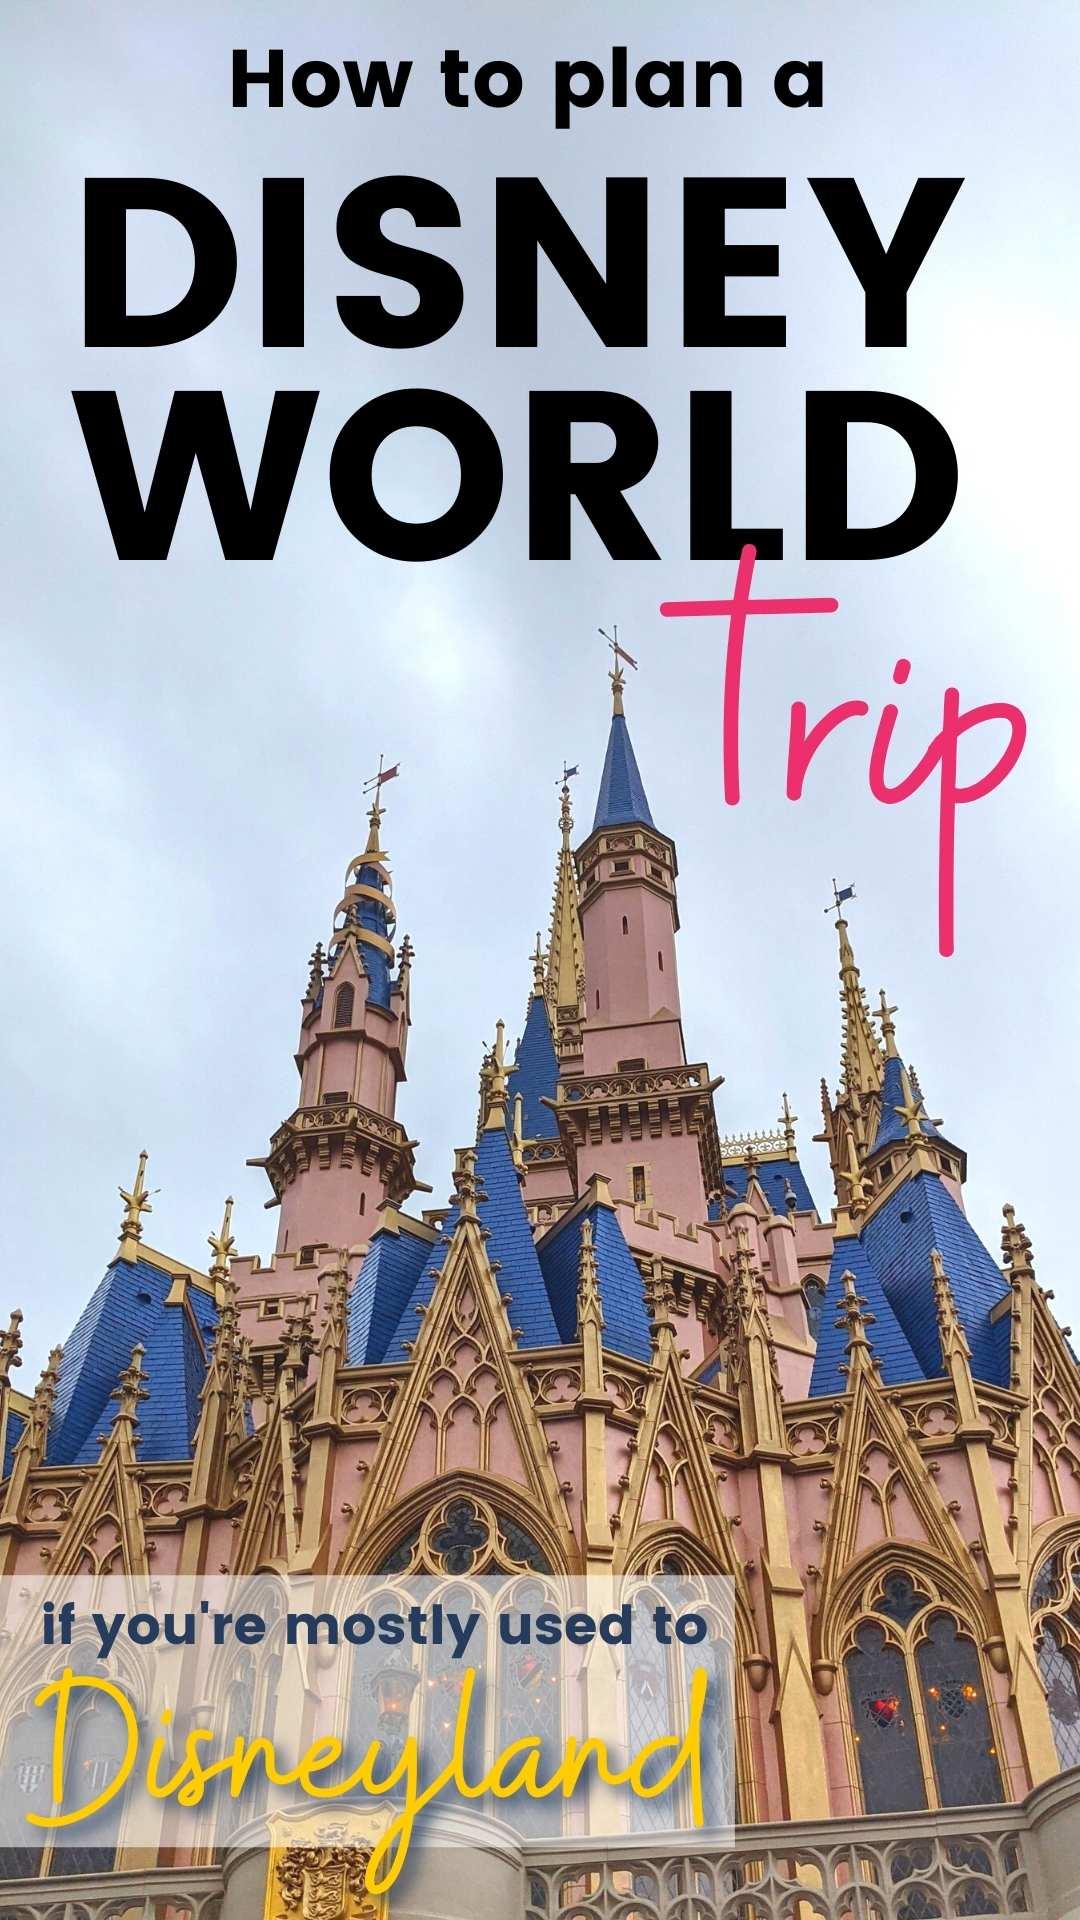 Top 6 Difference Between Disneyland and Disney World via @pullingcurls